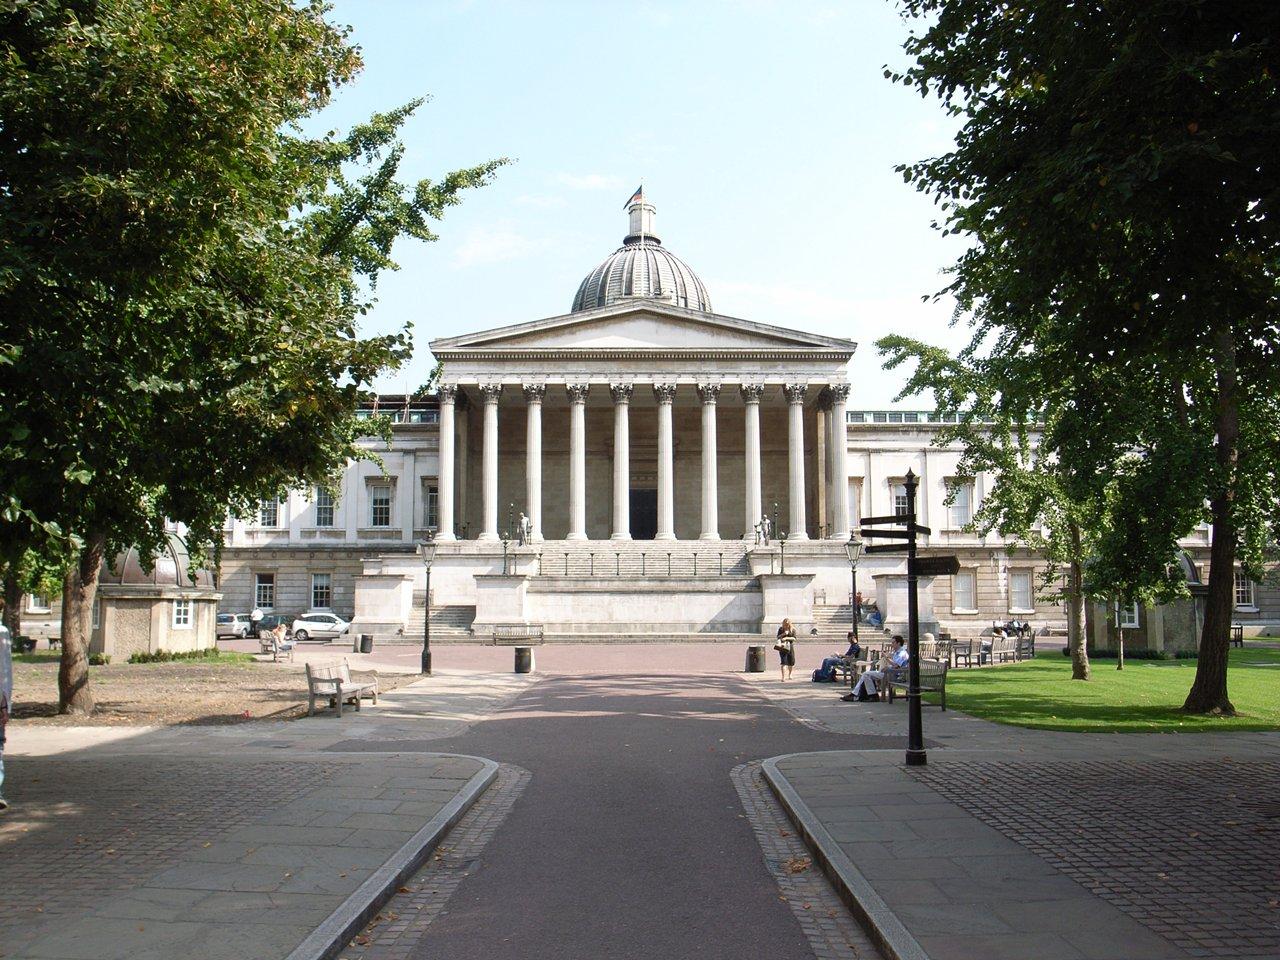 University_College_London.jpg